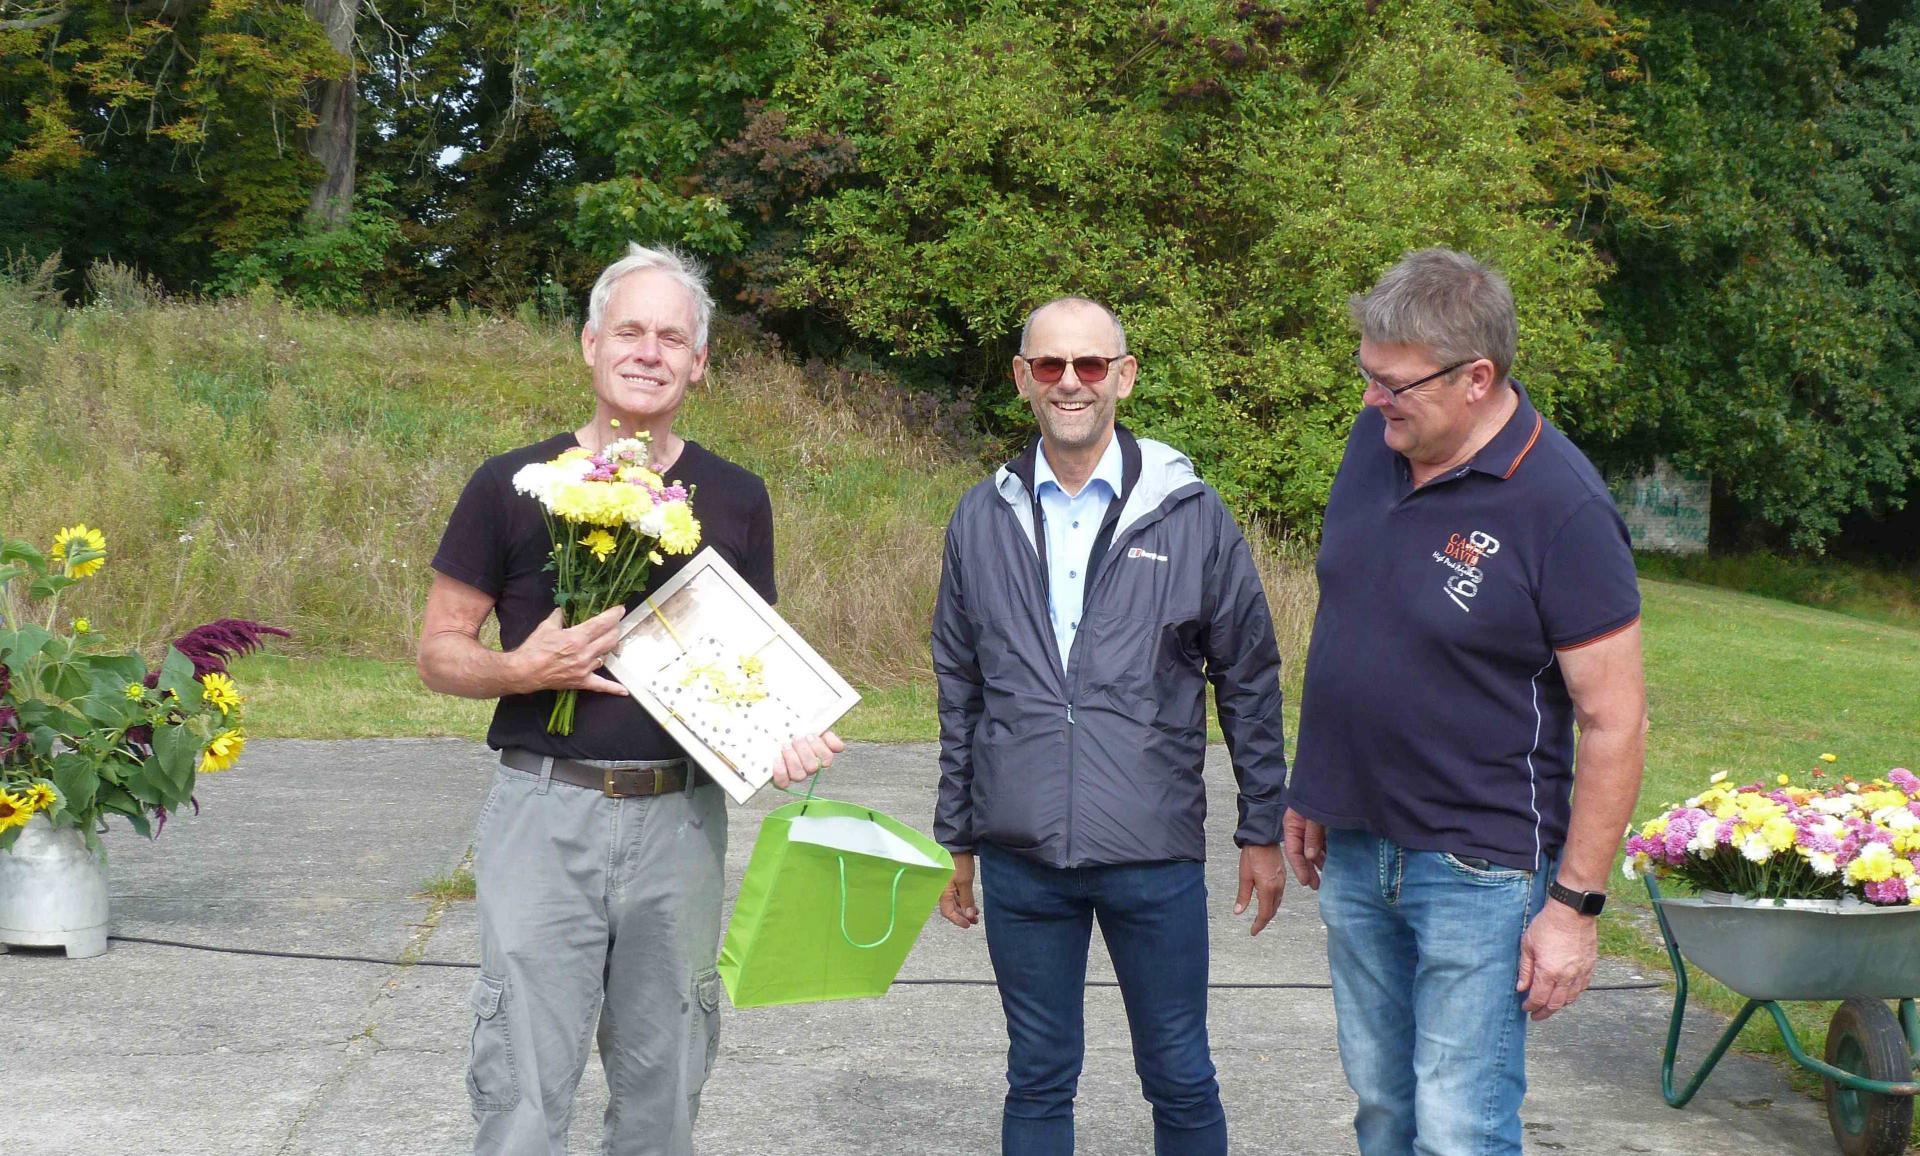 Feldmaerker des Jahres 2020 -  Manfred Geske